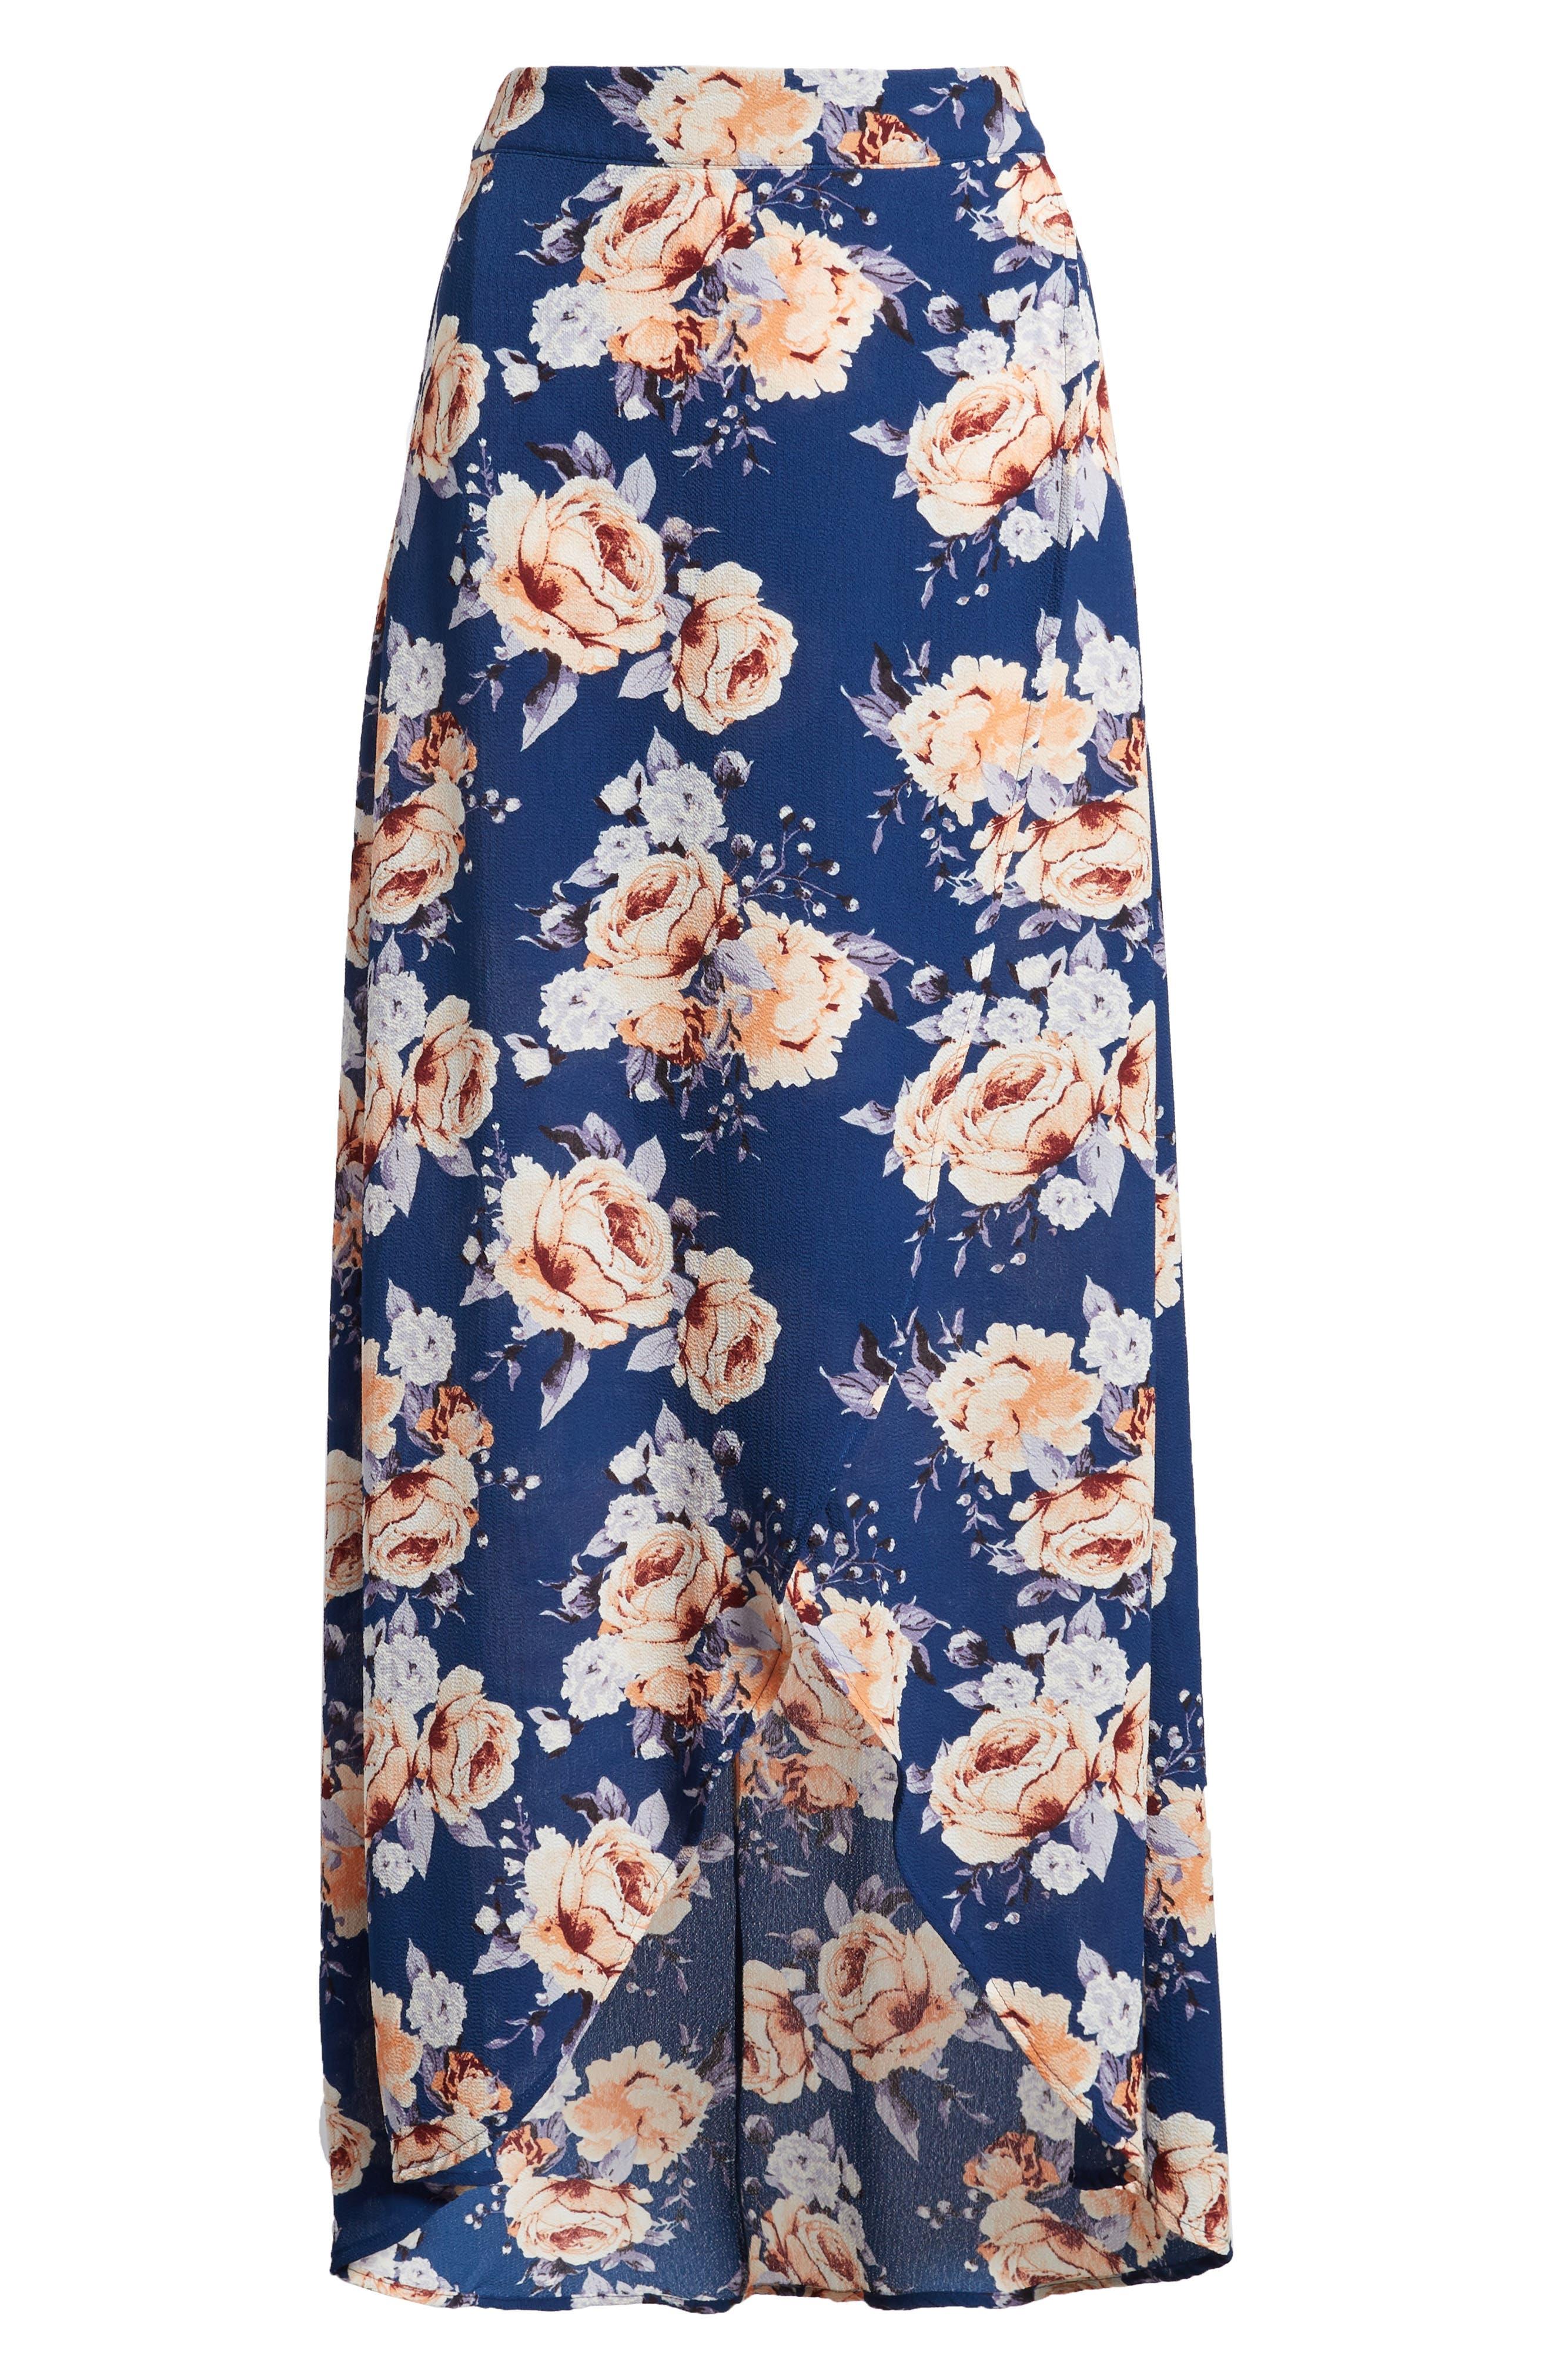 Floral Print Maxi Skirt,                             Alternate thumbnail 6, color,                             Blue Floral